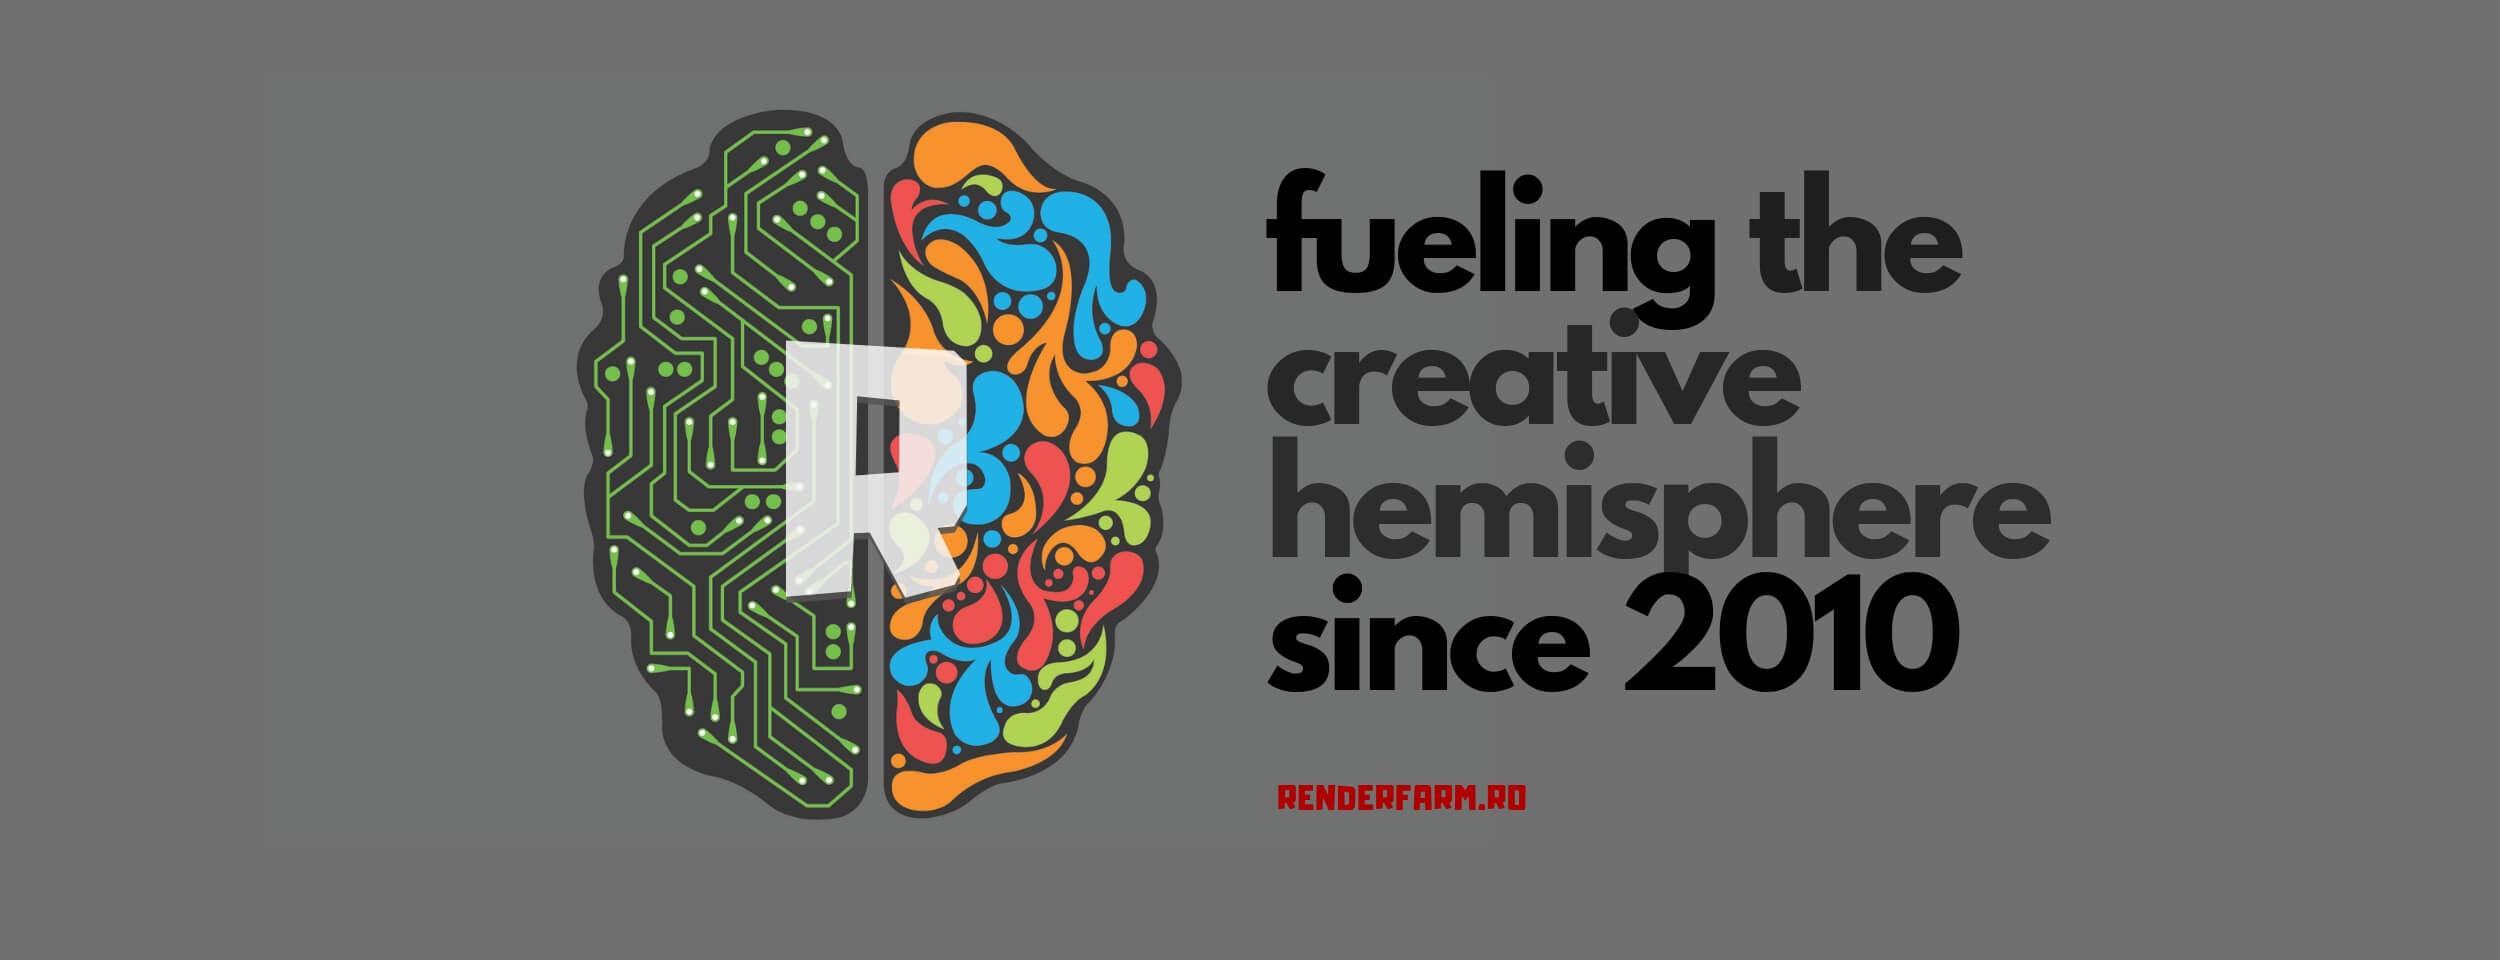 RENDERFARM_RO_Slide_Creative_Hemisphere